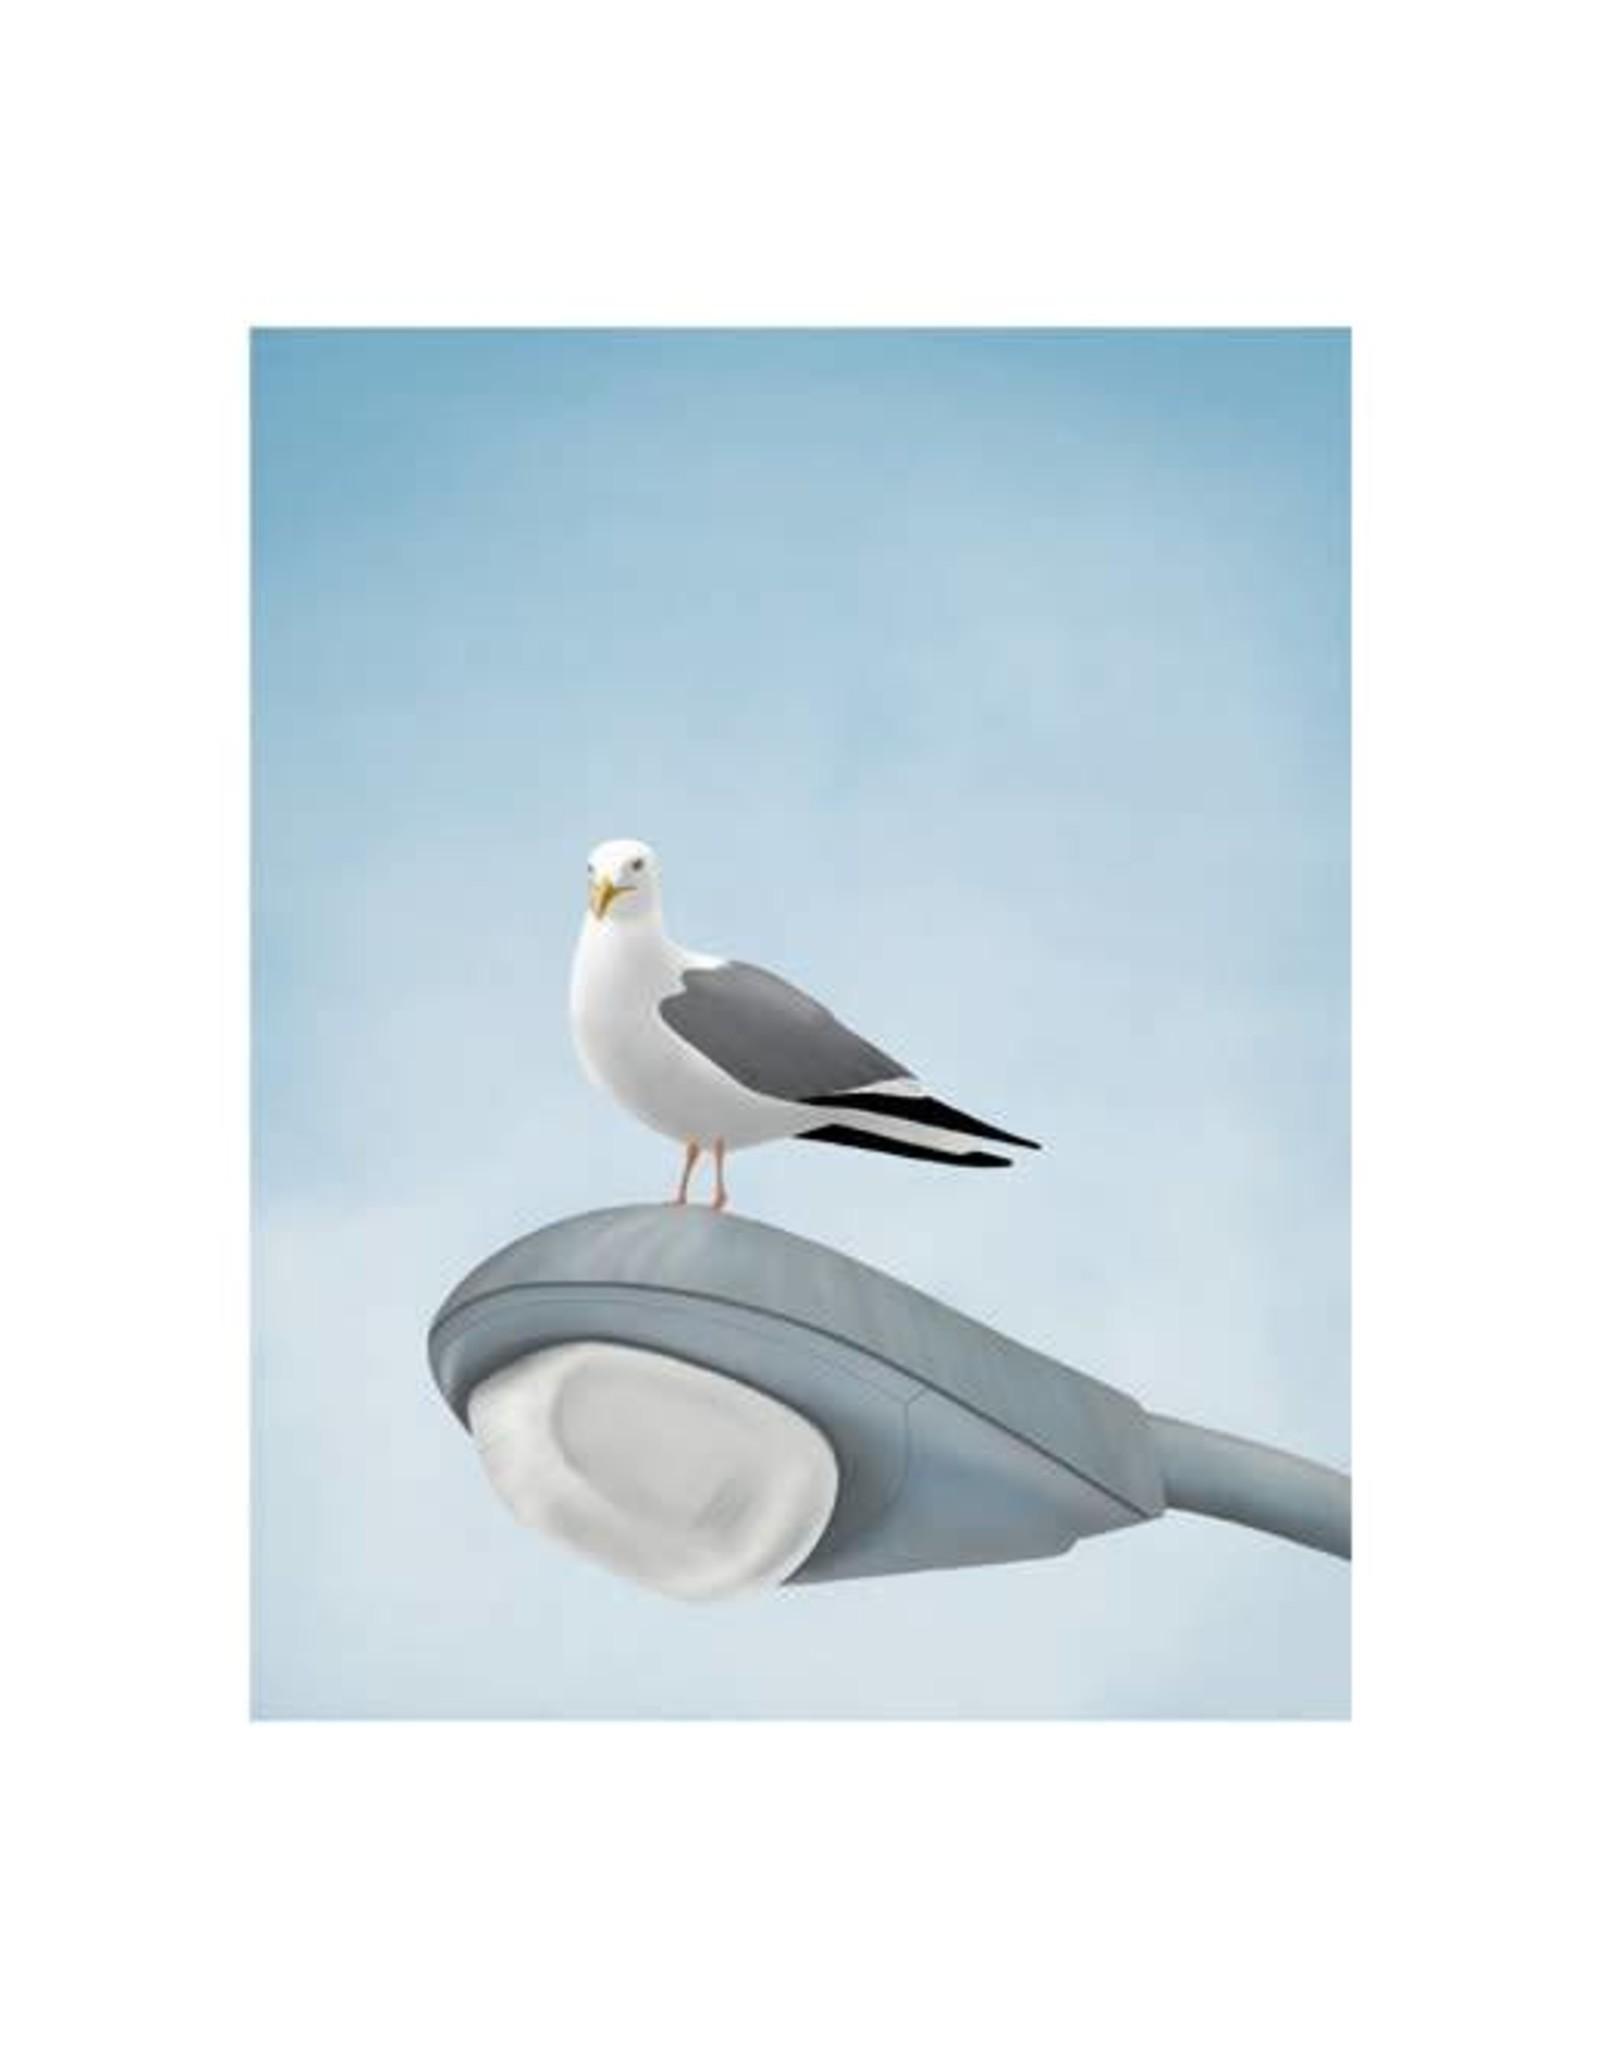 Seagull Lampost Print